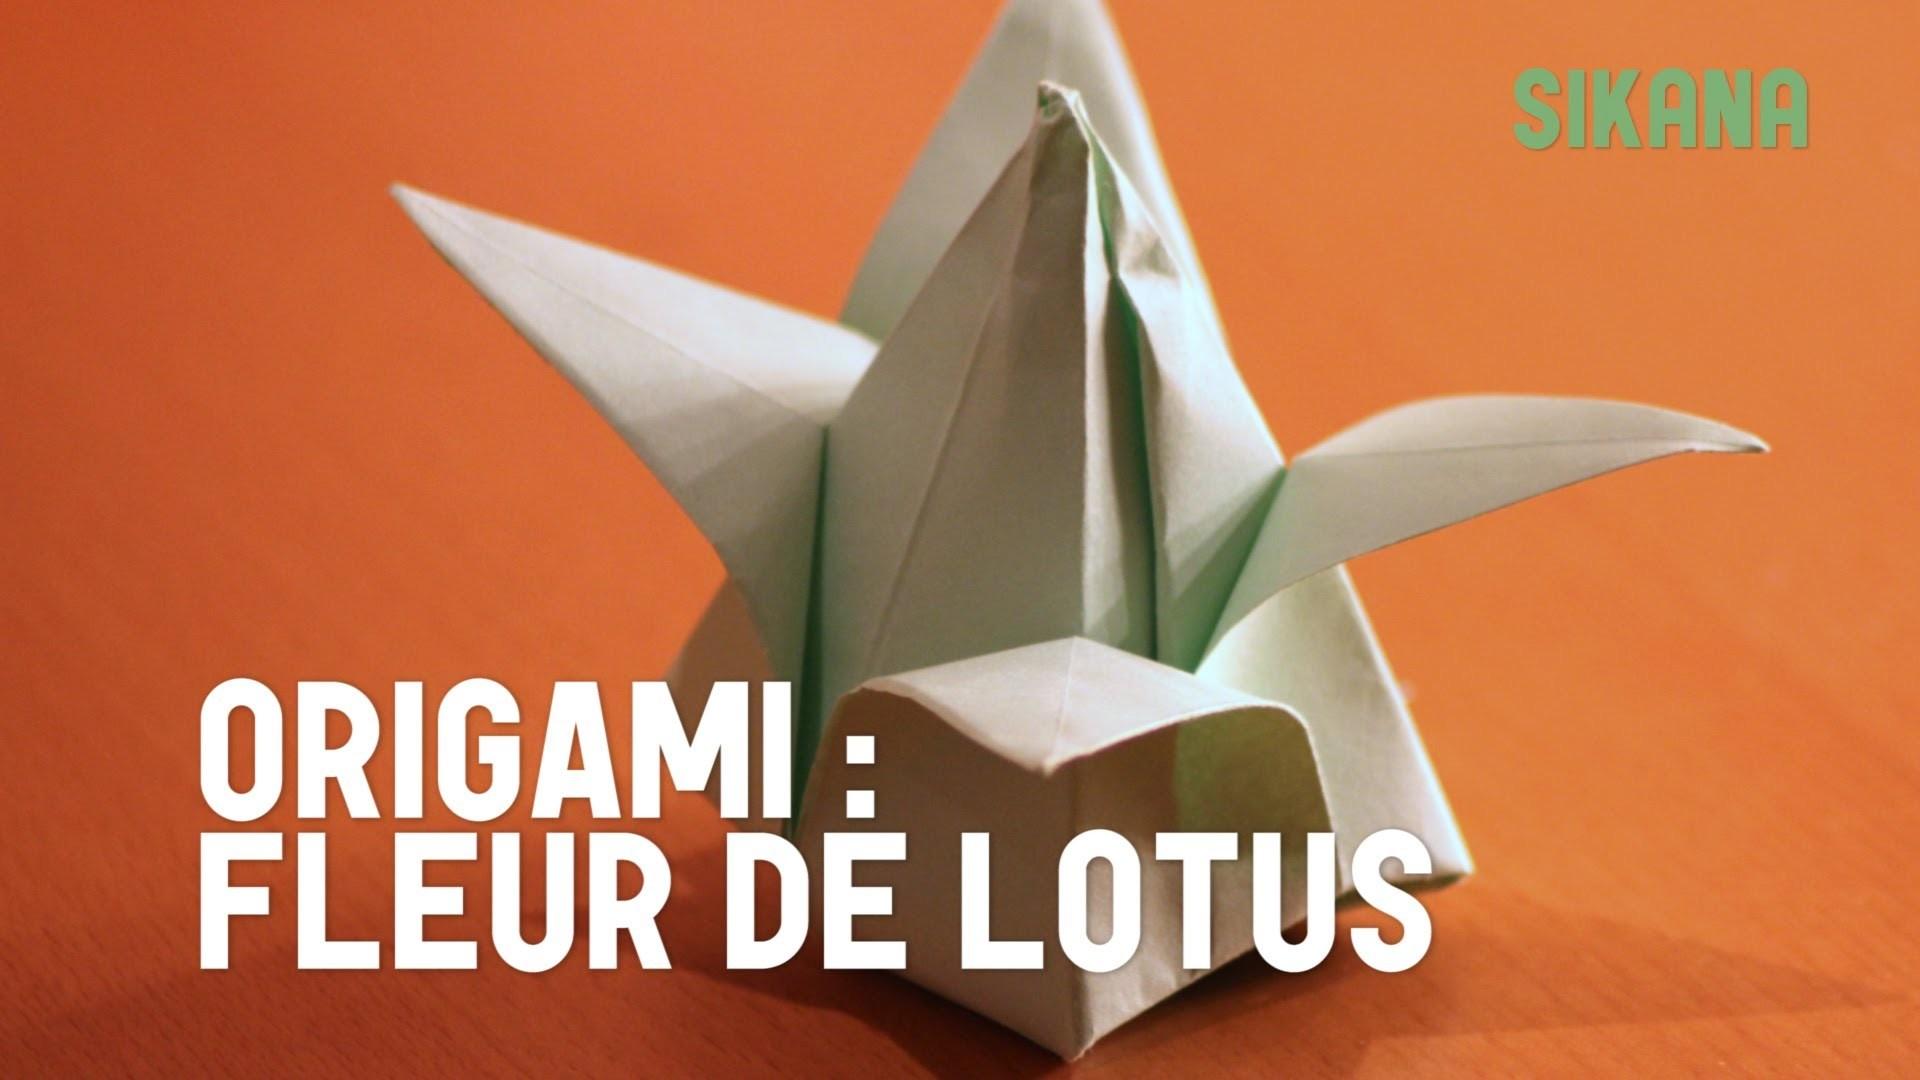 origami fleur de lotus gonflable en papier hd. Black Bedroom Furniture Sets. Home Design Ideas